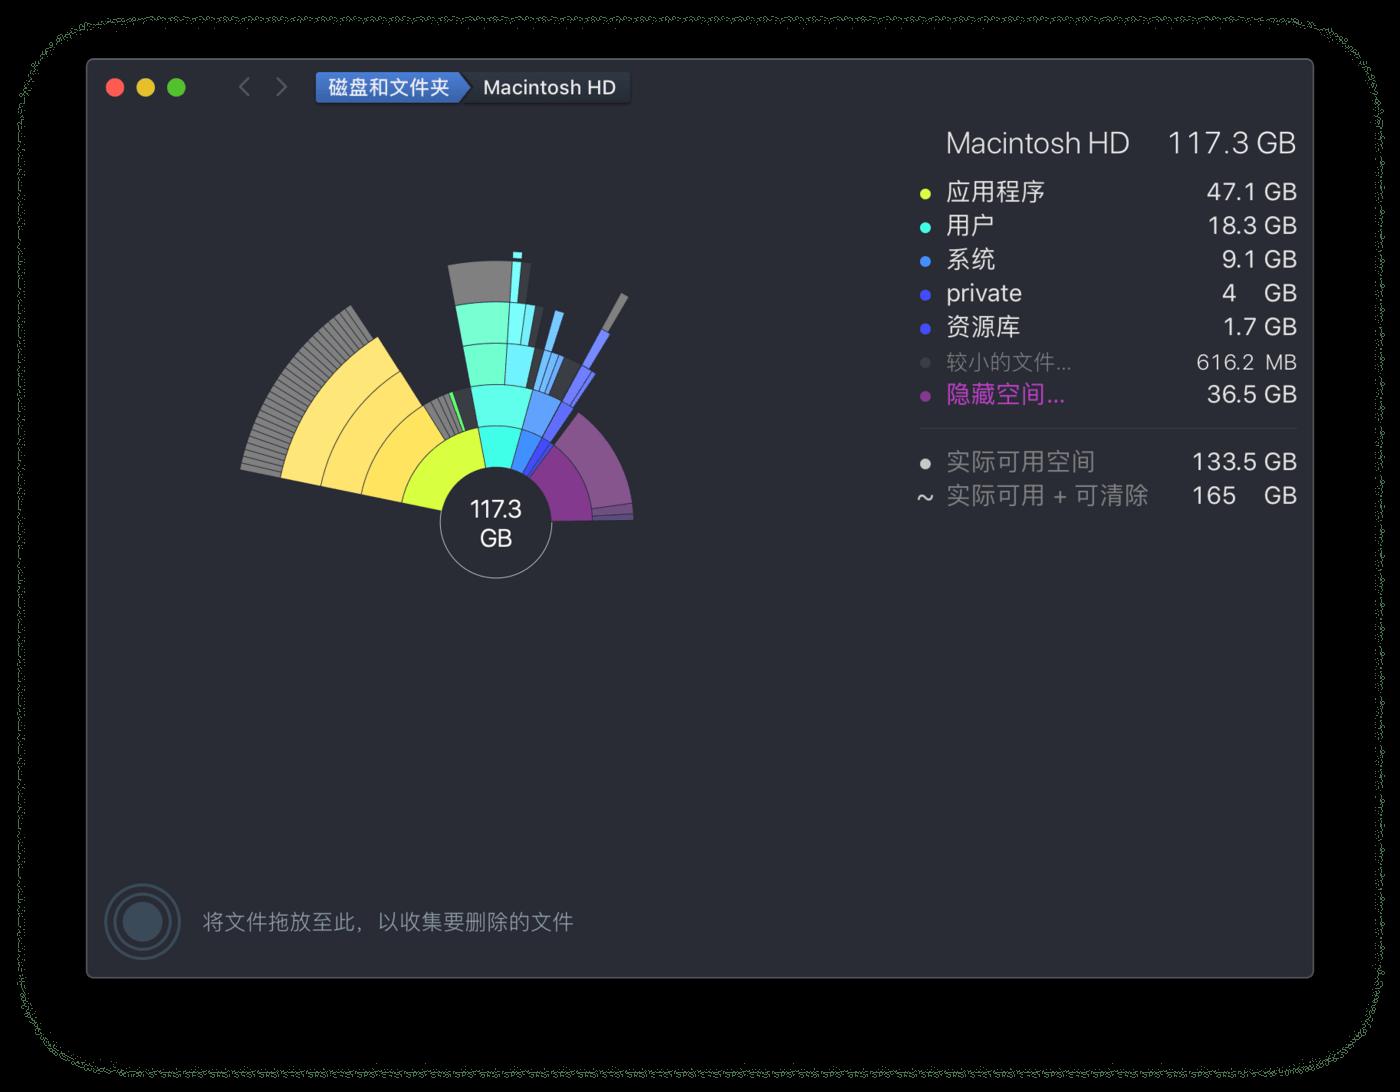 DaisyDisk 显示磁盘占用情况